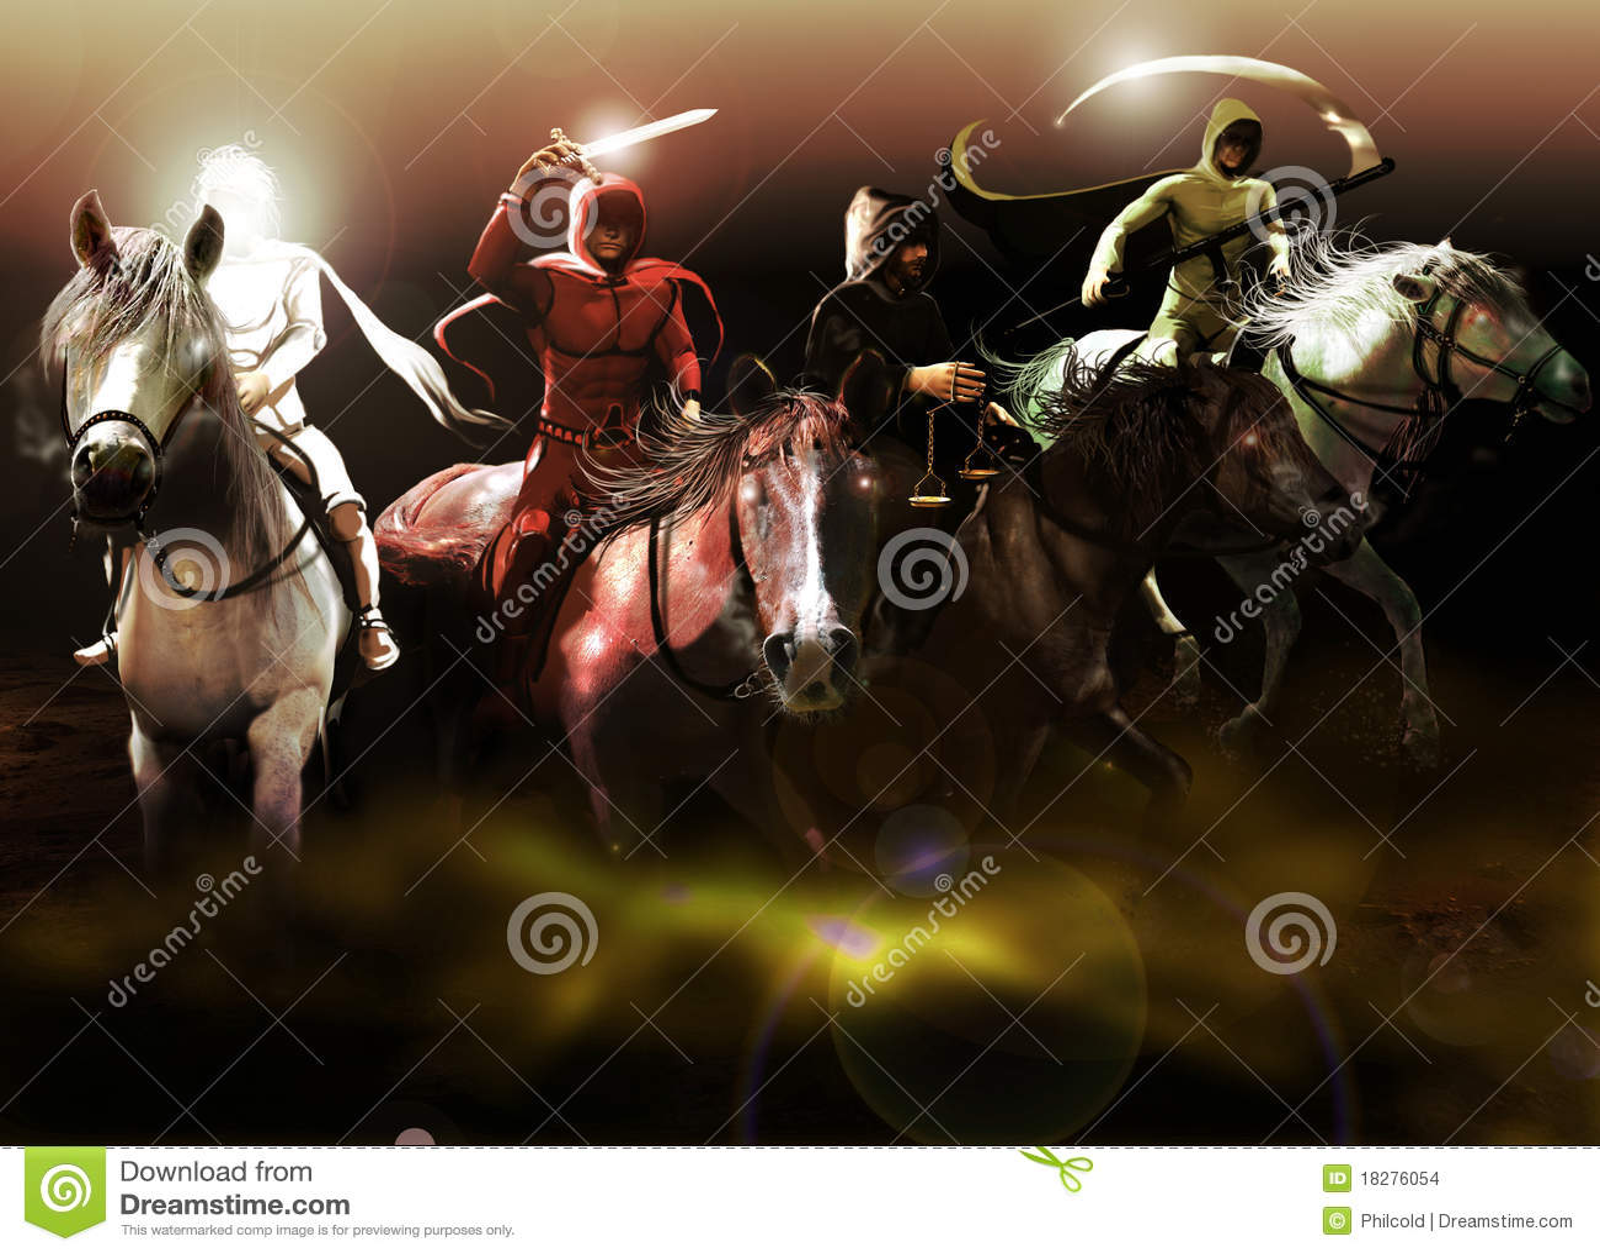 The Four Horsemen Of The Apocalypse Stock Illustration